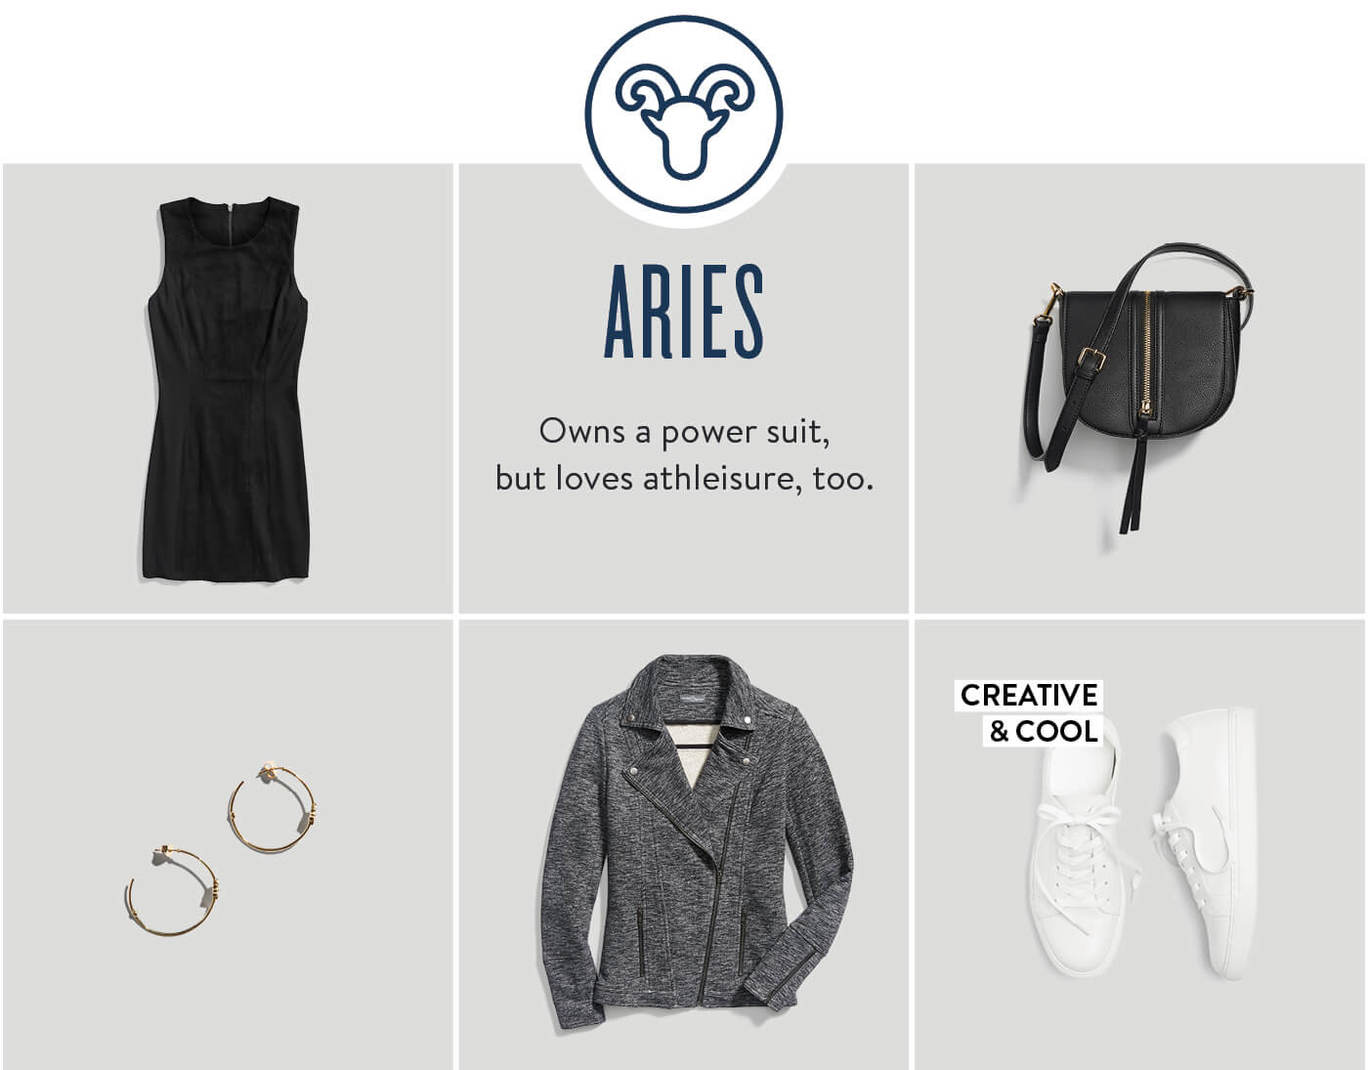 Aries: